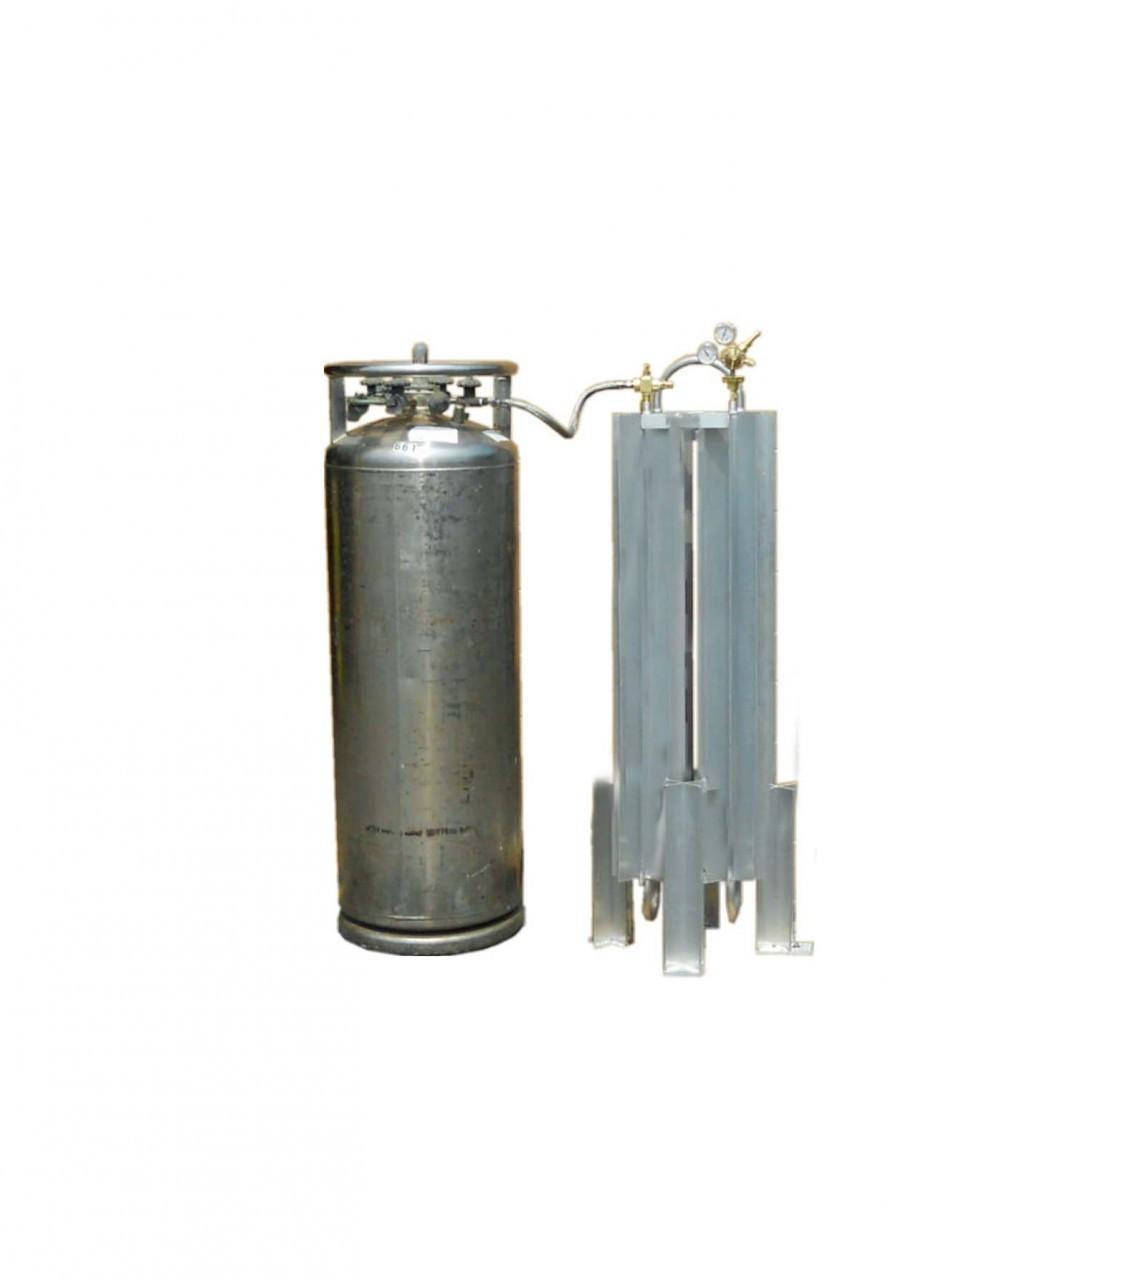 Vaporizer, 1000 scfh, 500 psi